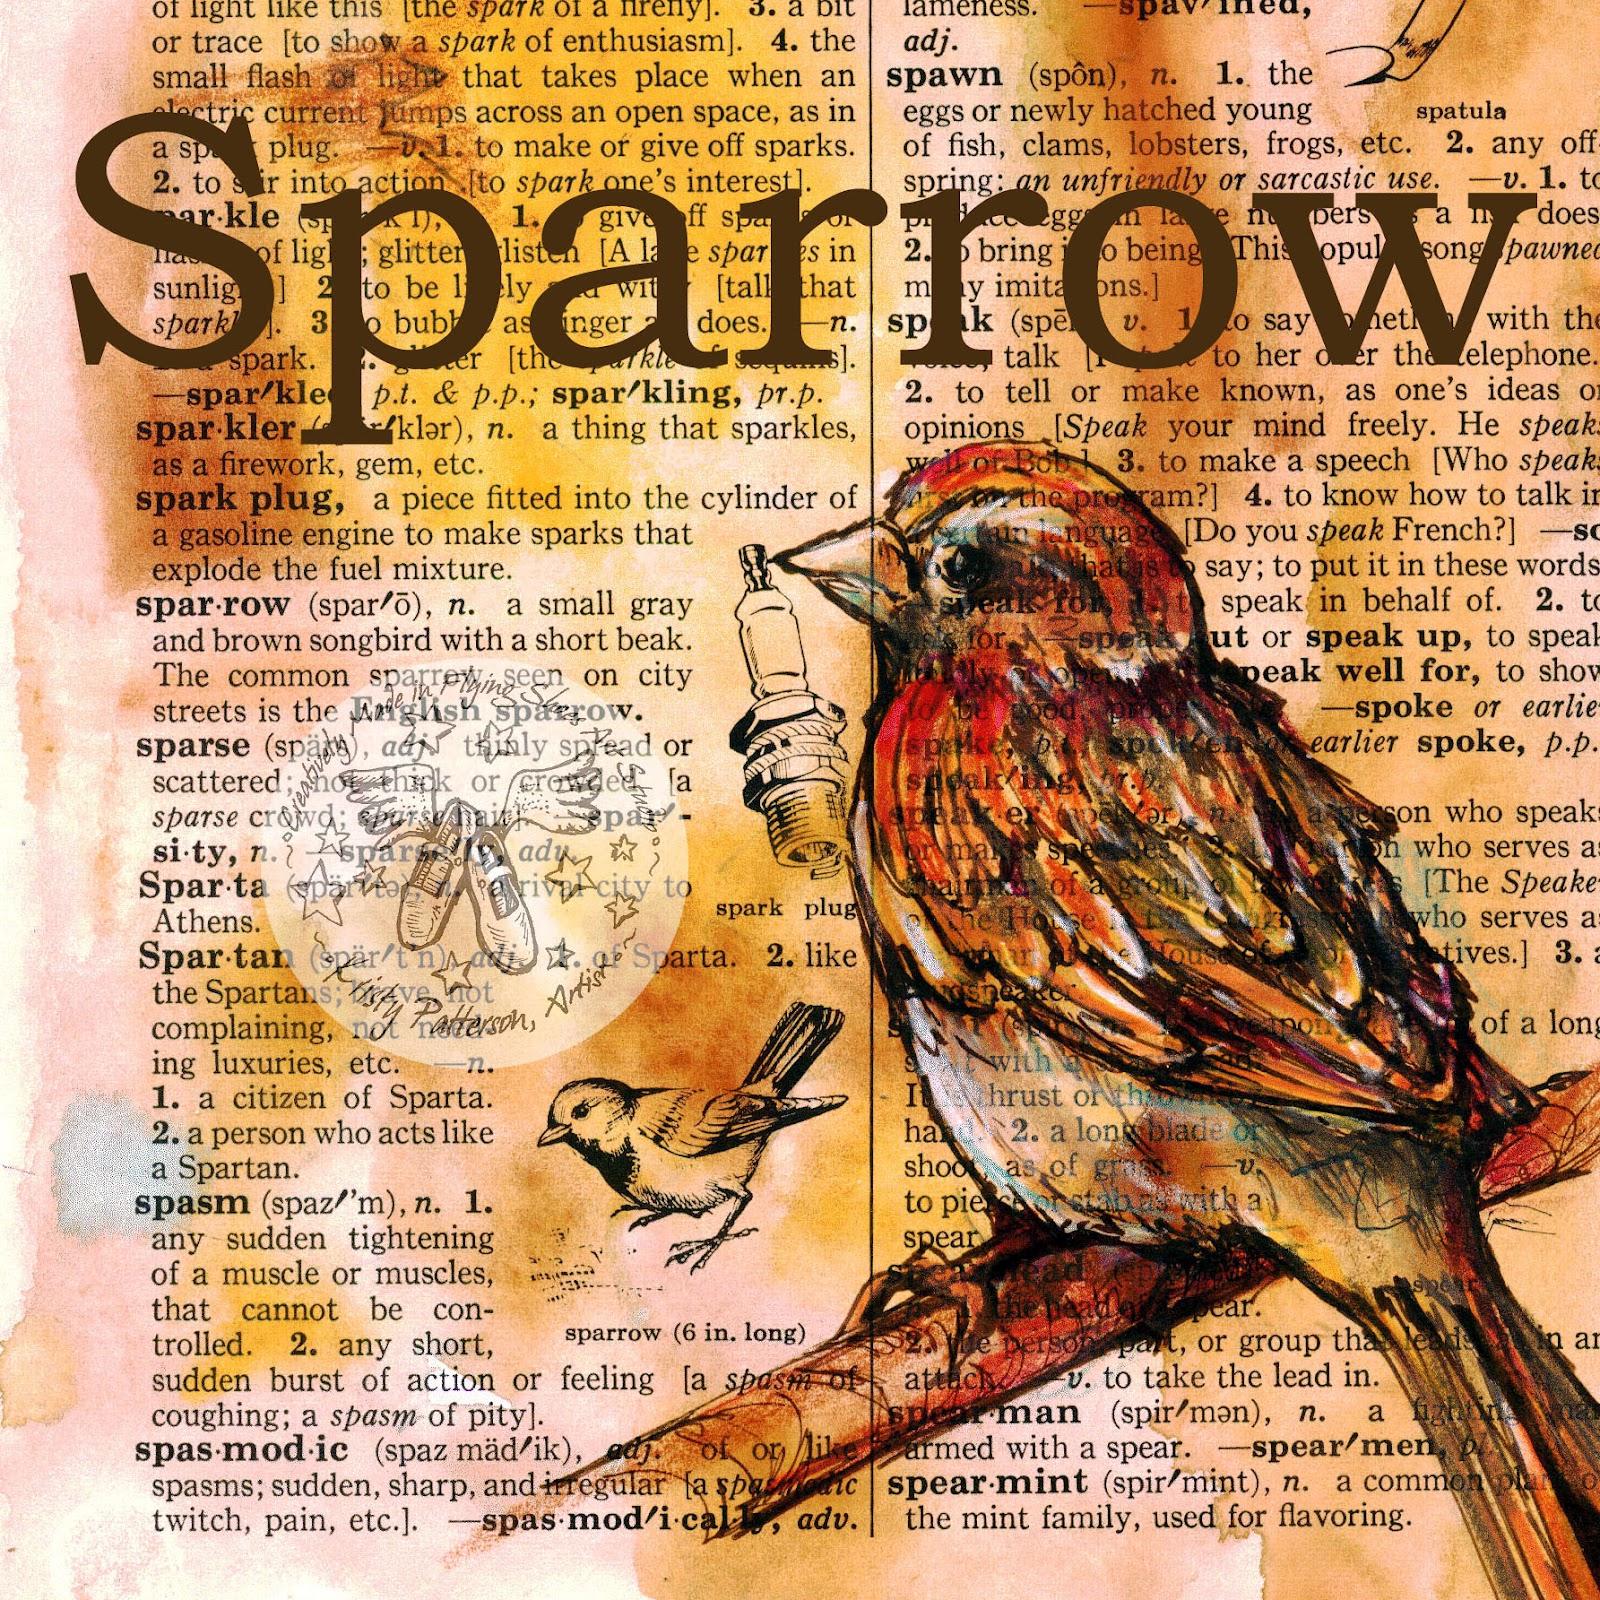 http://3.bp.blogspot.com/-fqh3OYqNX2o/T-SIEXTJWvI/AAAAAAAAAyU/ZDpZA-p5nmk/s1600/sparrow%2Btext%2Bcopy.jpg